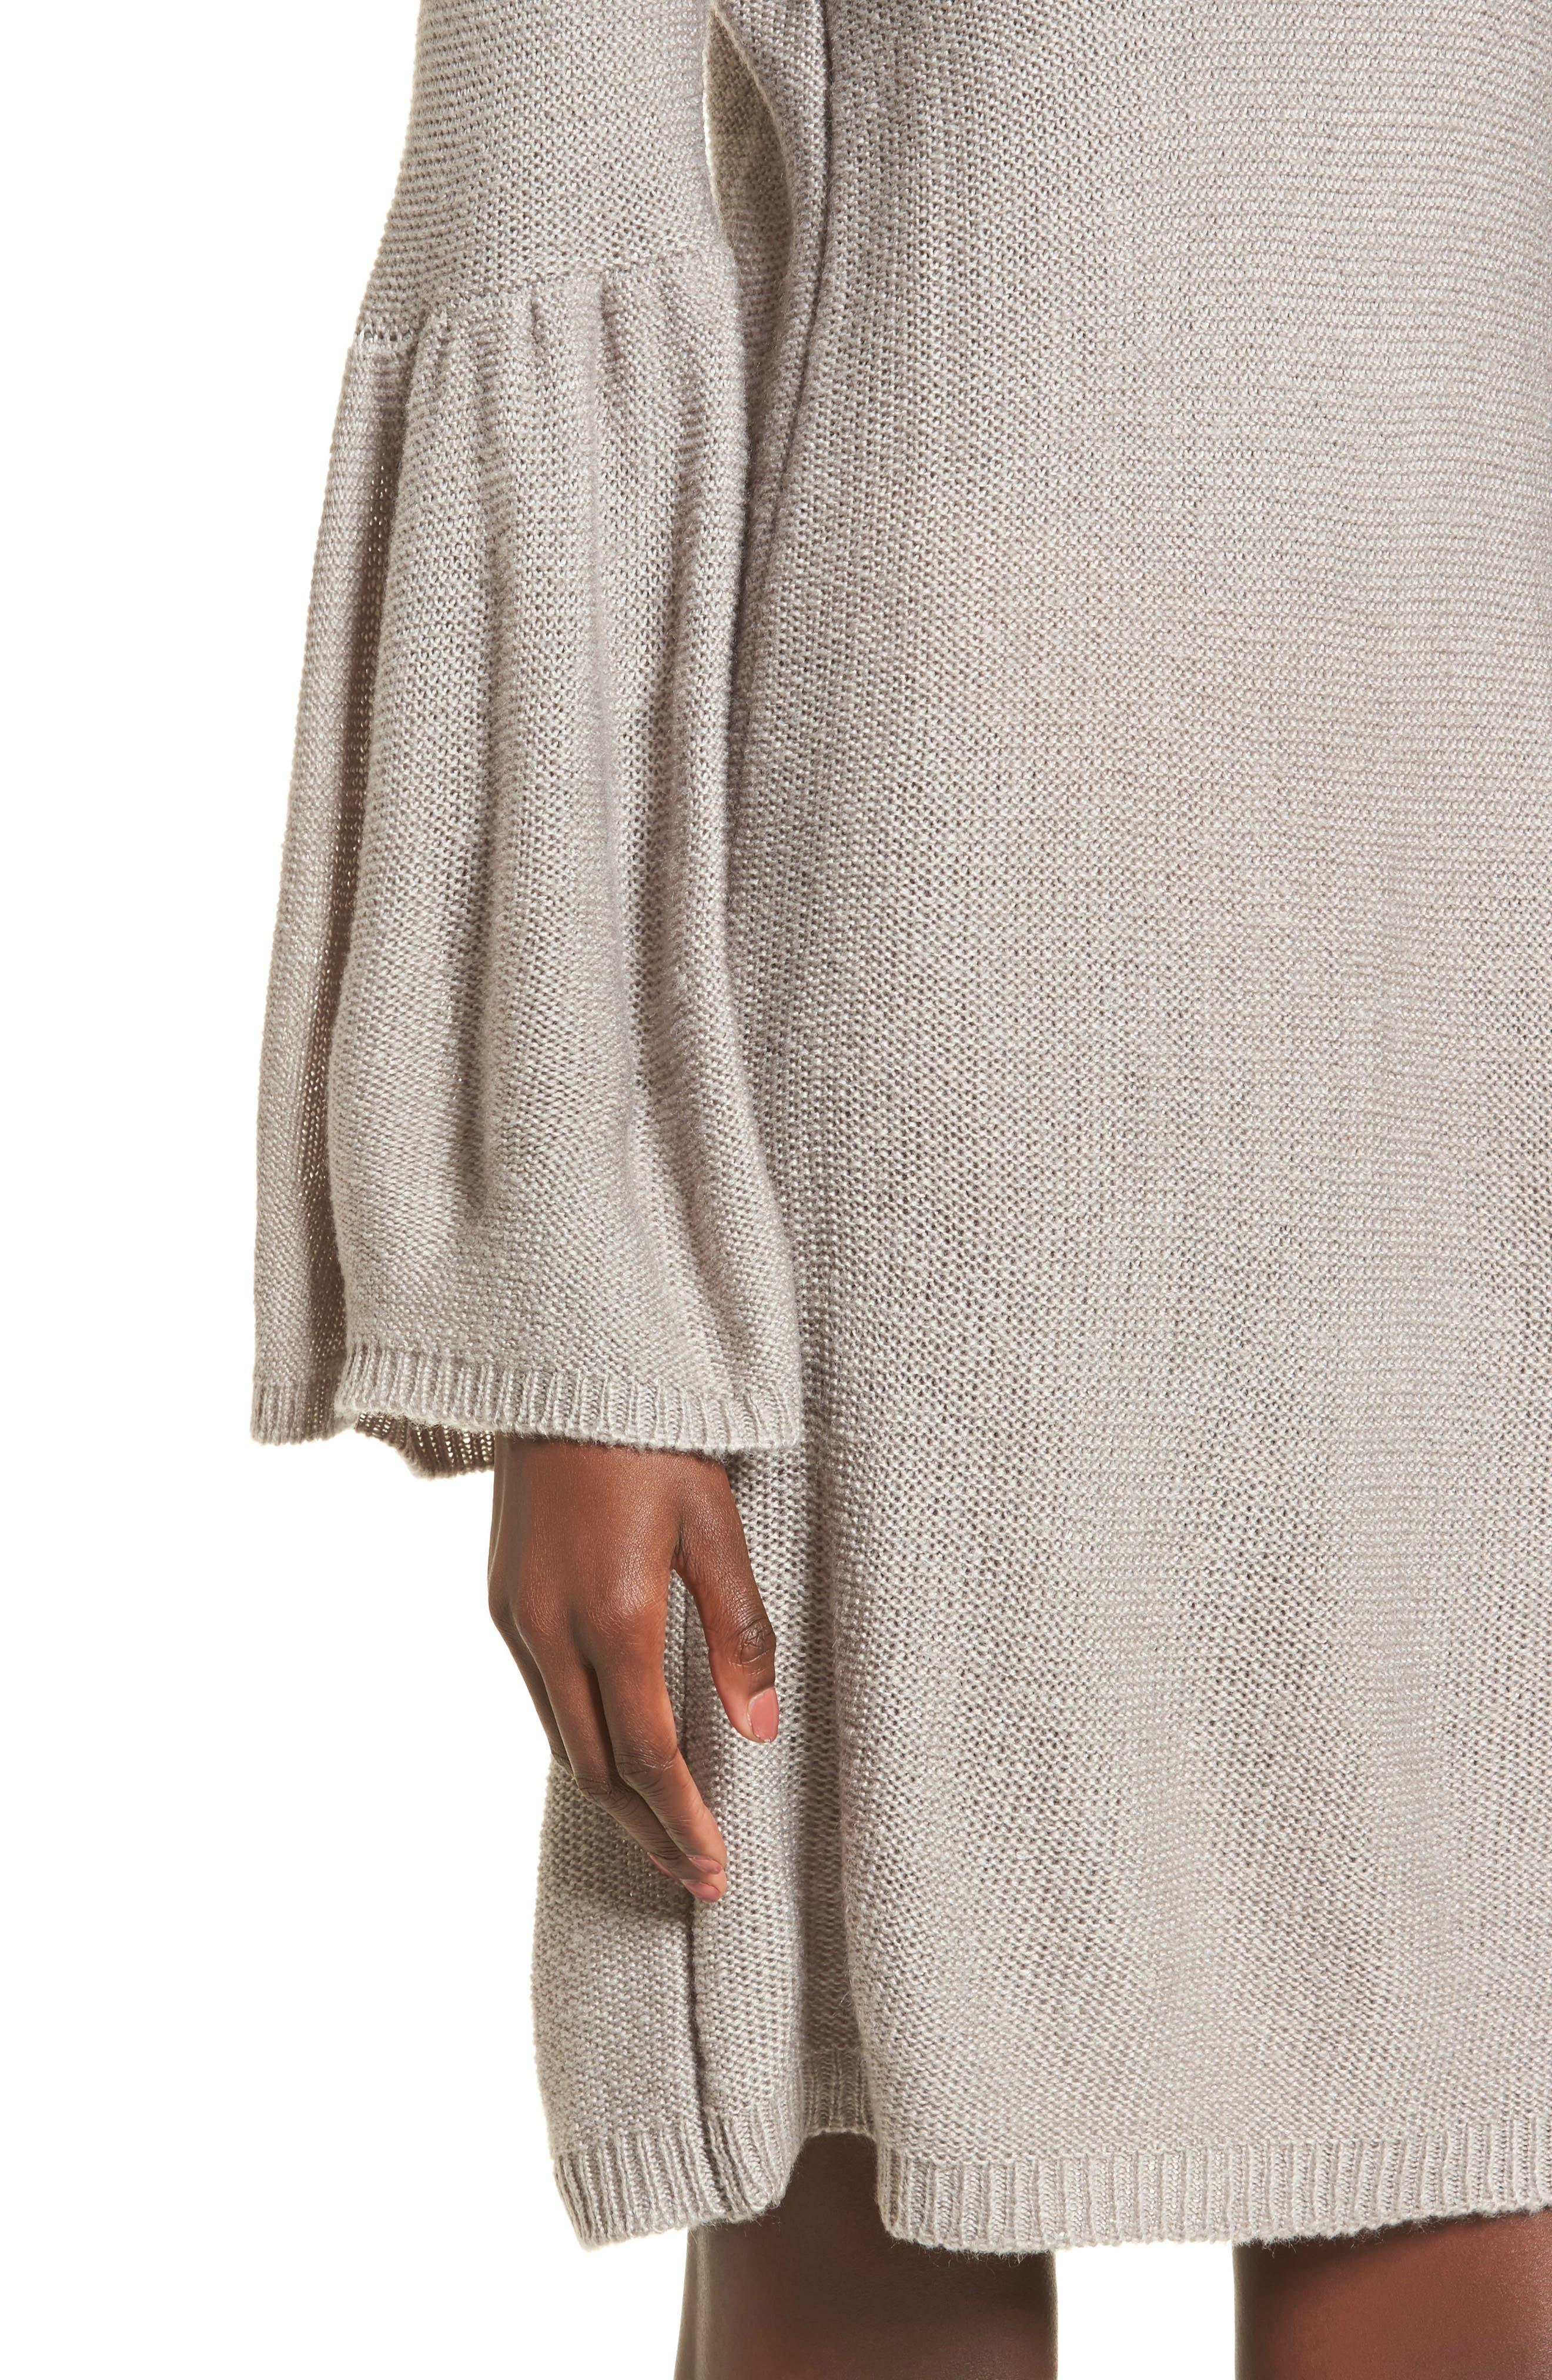 Bell Sleeve Sweater Dress,                             Alternate thumbnail 4, color,                             Light Heather Grey